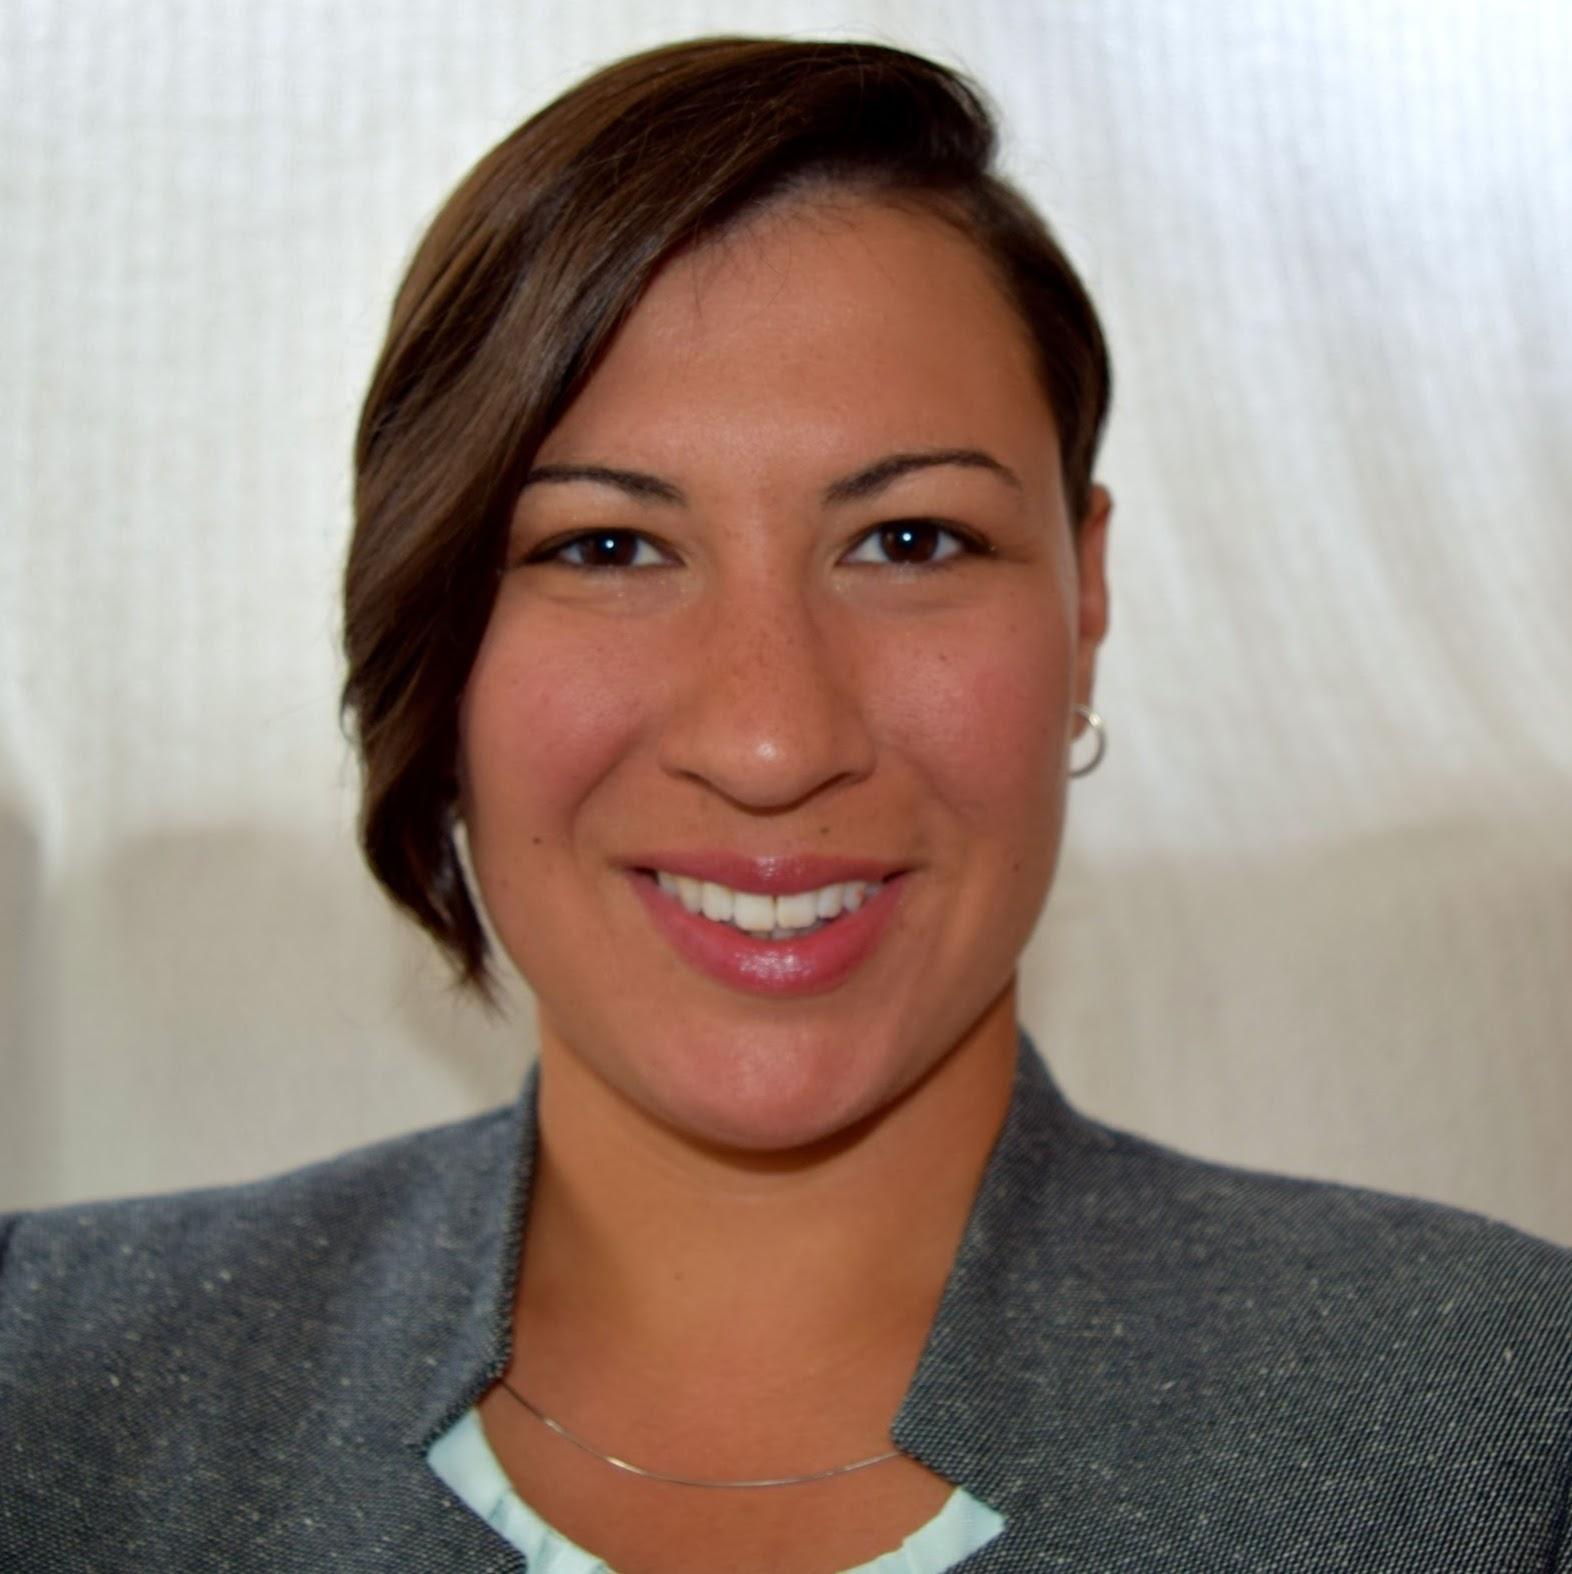 Christina Natalello, Whitehorse Middle